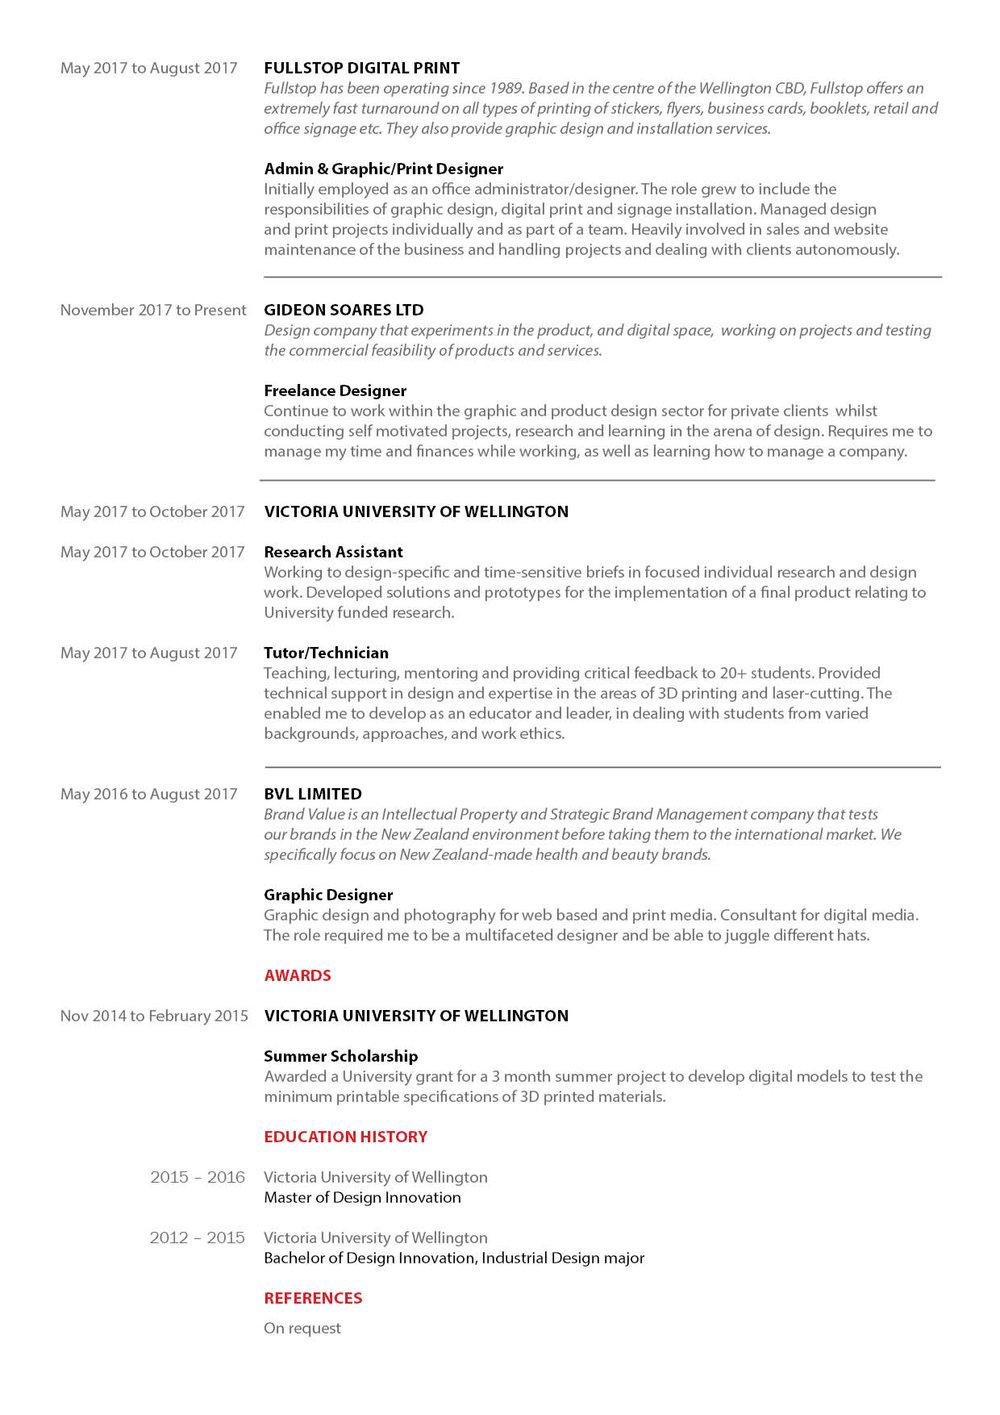 curriculum_vitae_gideonsoares2.jpg